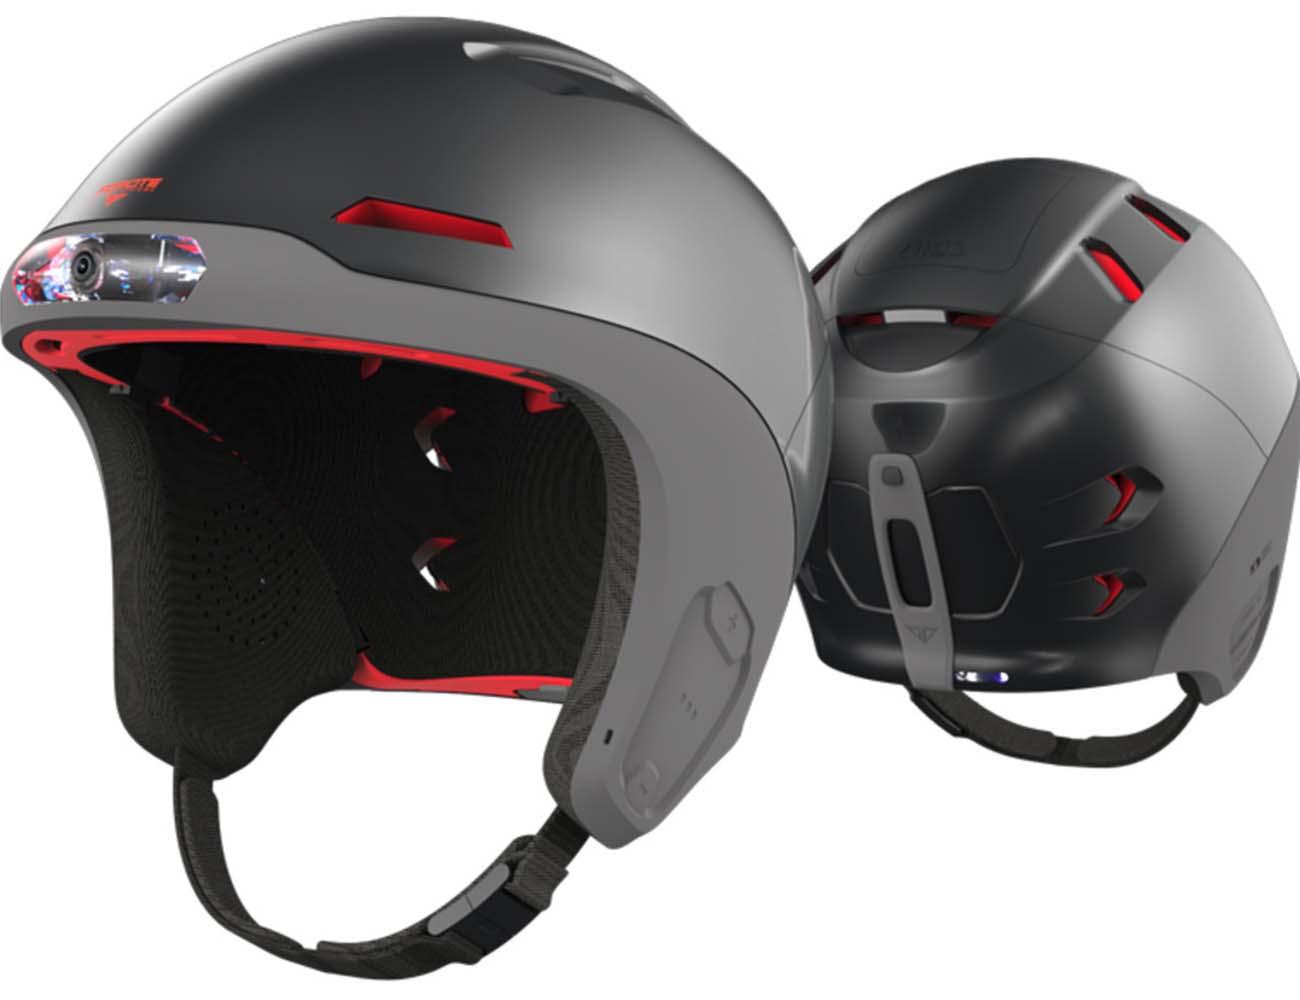 Forcite Alpine – Smart Helmet for Snow Sports